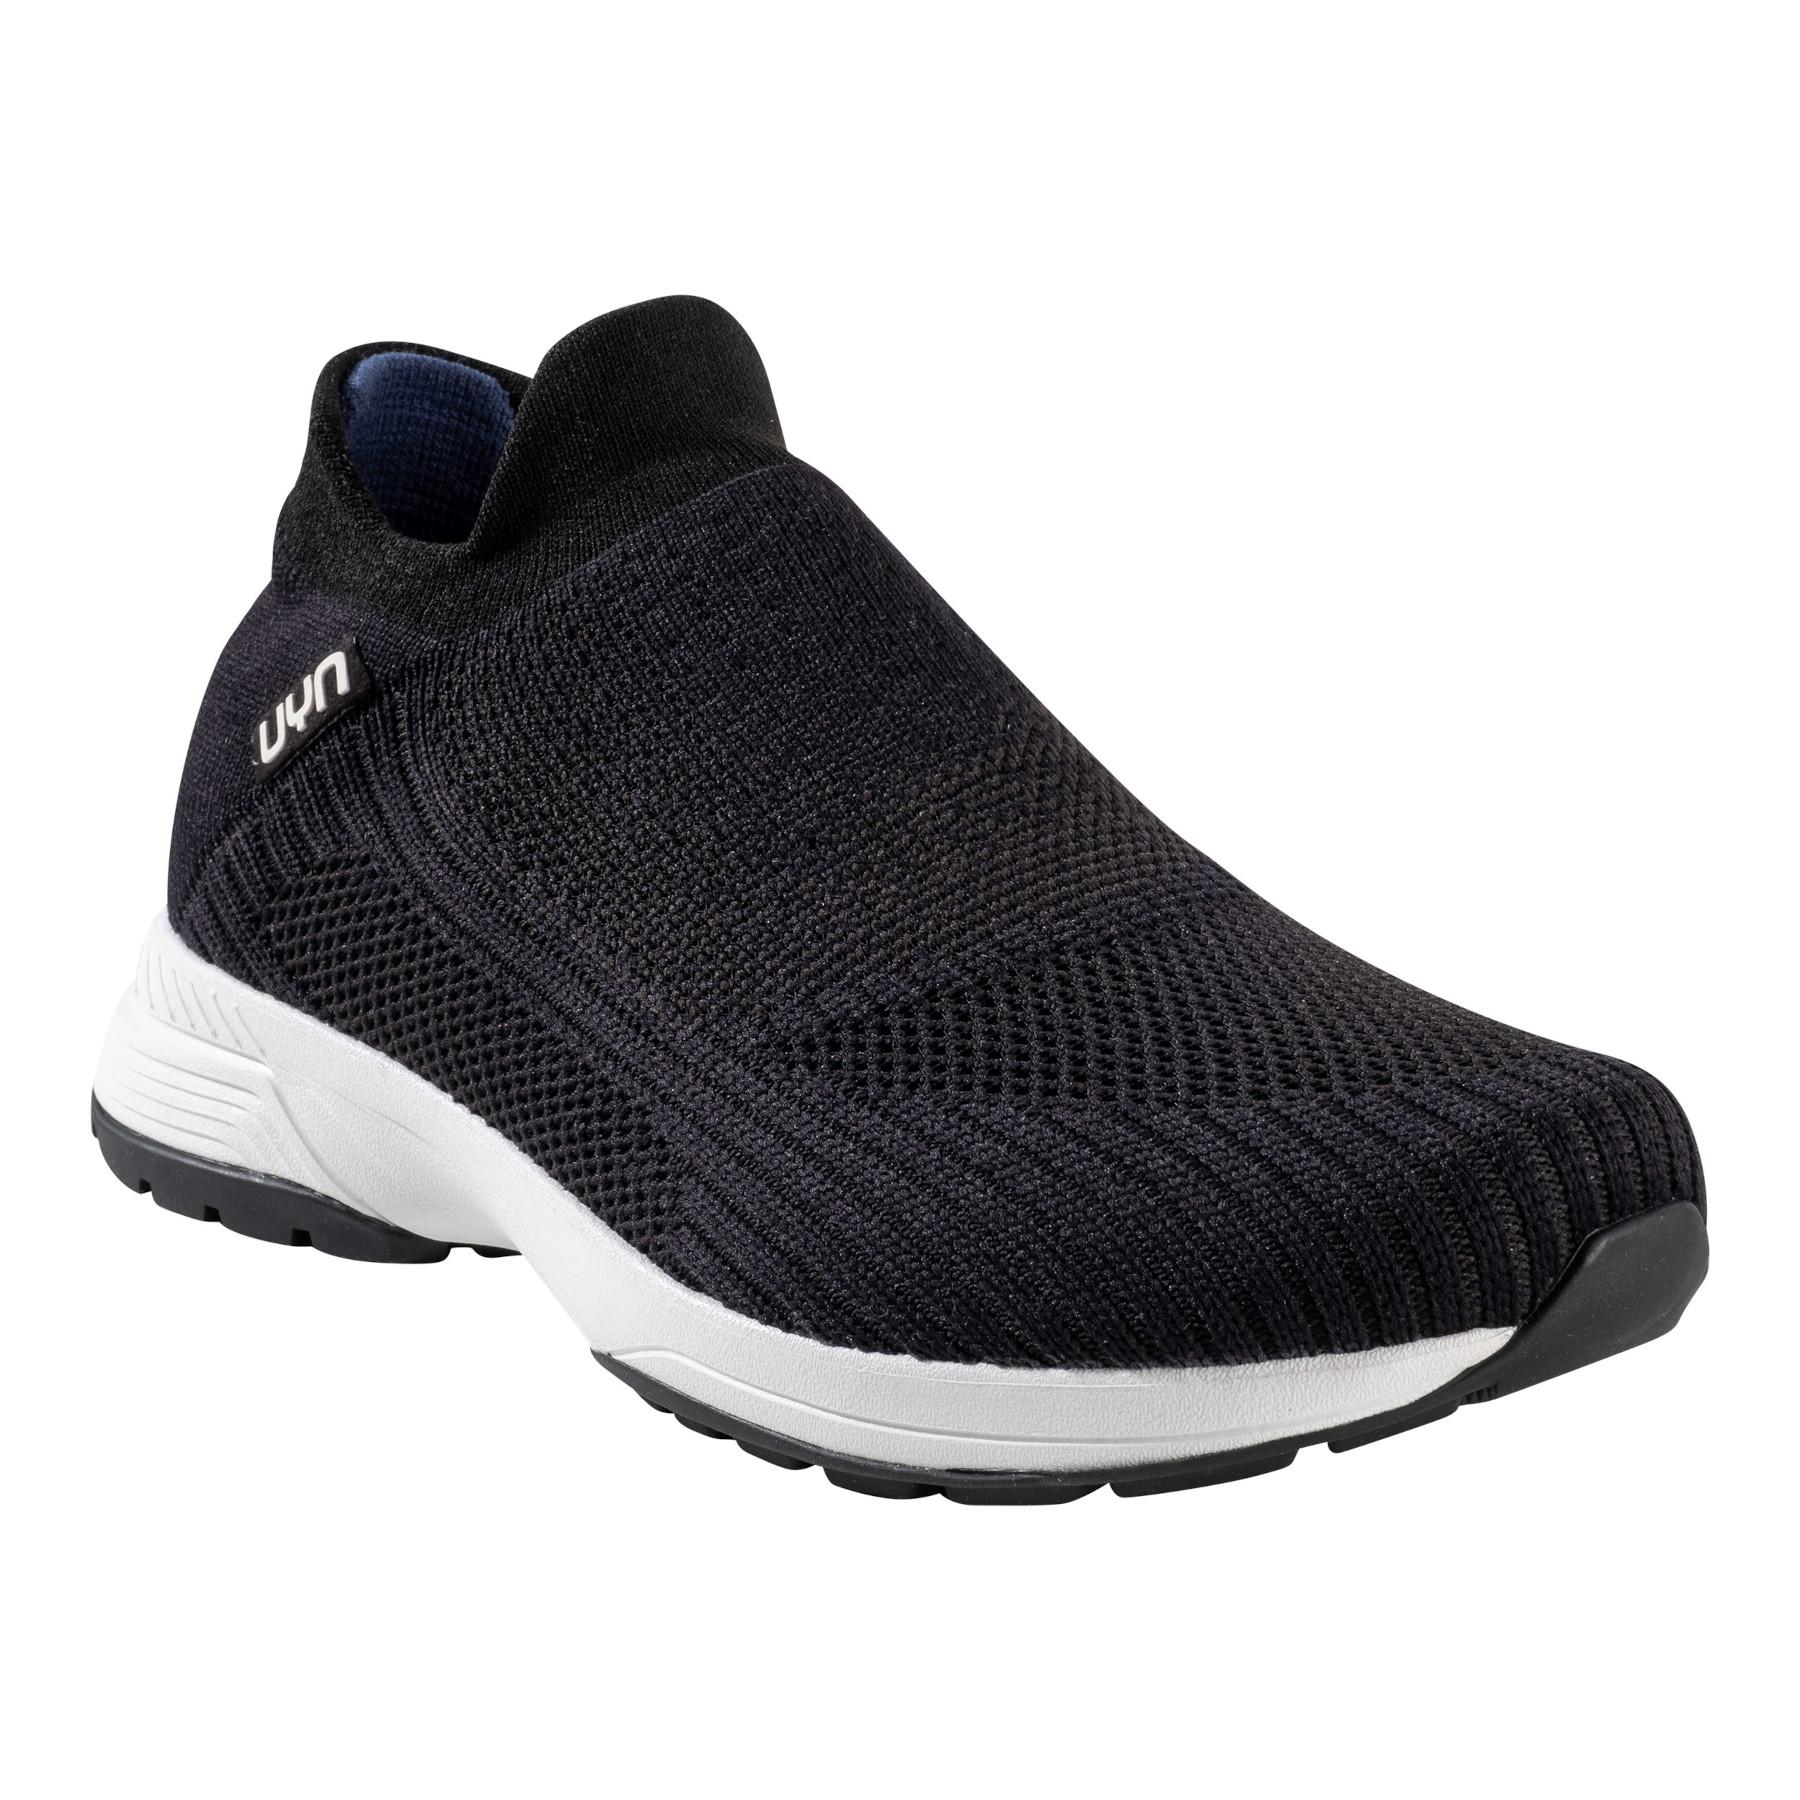 UYN Free Flow Grade Man Running Shoes - Black/Carbon